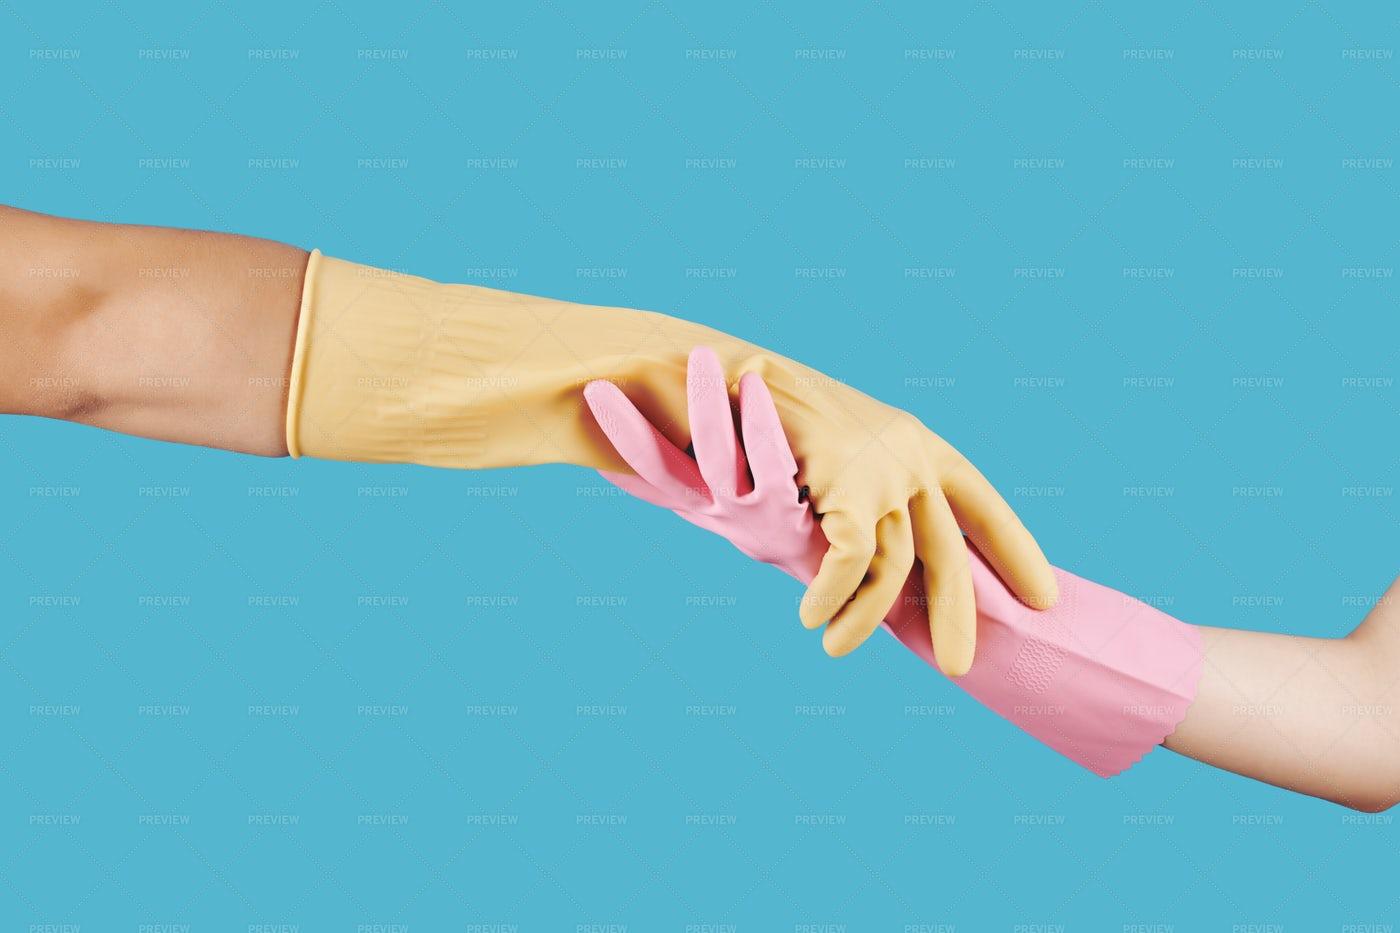 Helping Hand Concept: Stock Photos